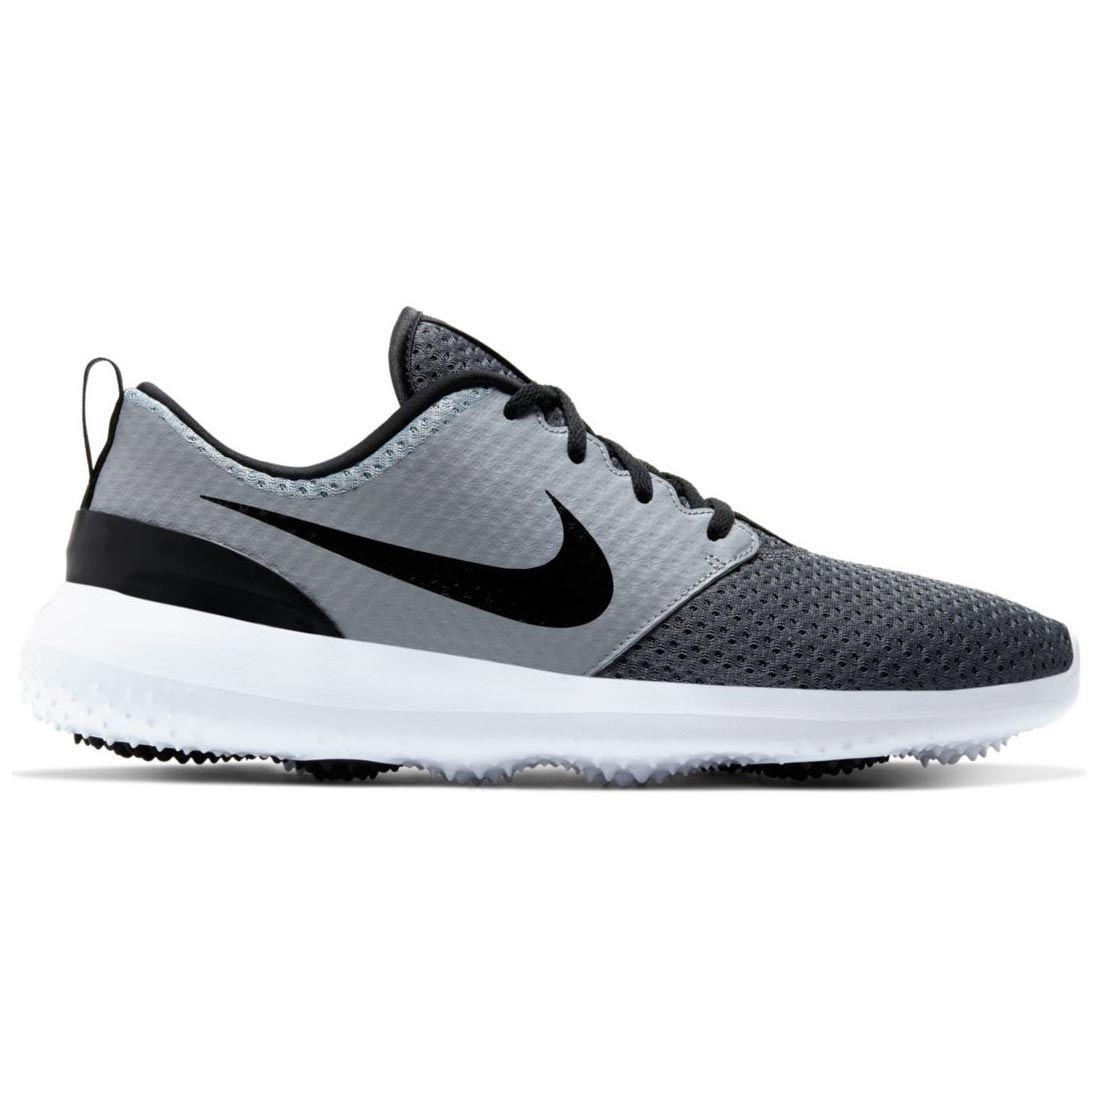 antiguo Colectivo Uganda  Buy Nike Roshe G Golf Shoes Anthracite/Black | Golf Discount